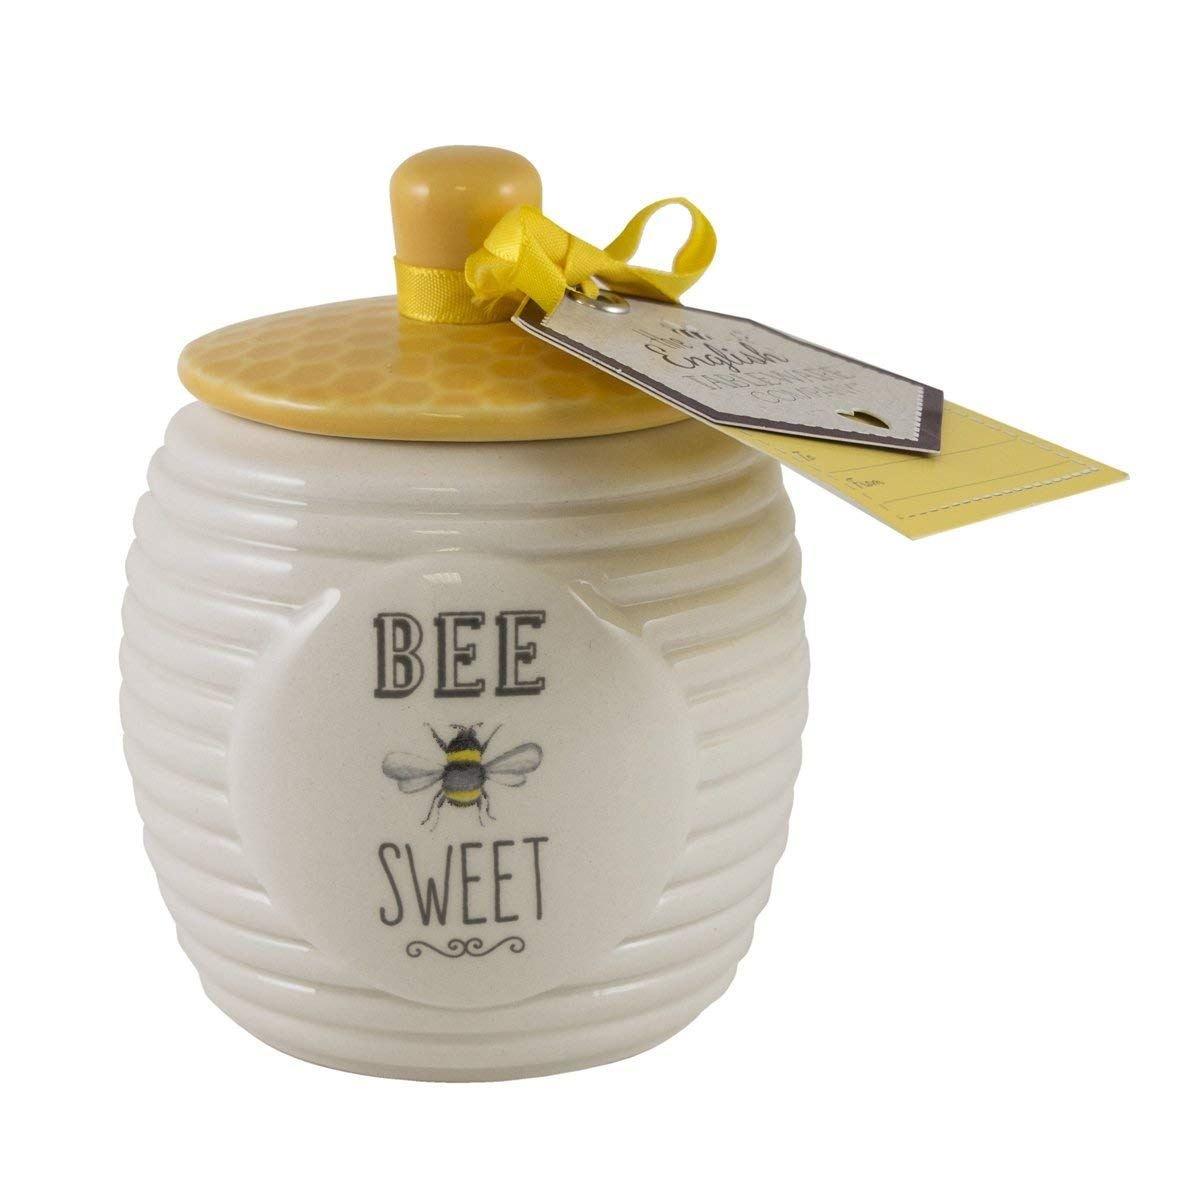 English Tableware Company Bee Happy Bee Sweet Sugar Pot David Mason Design